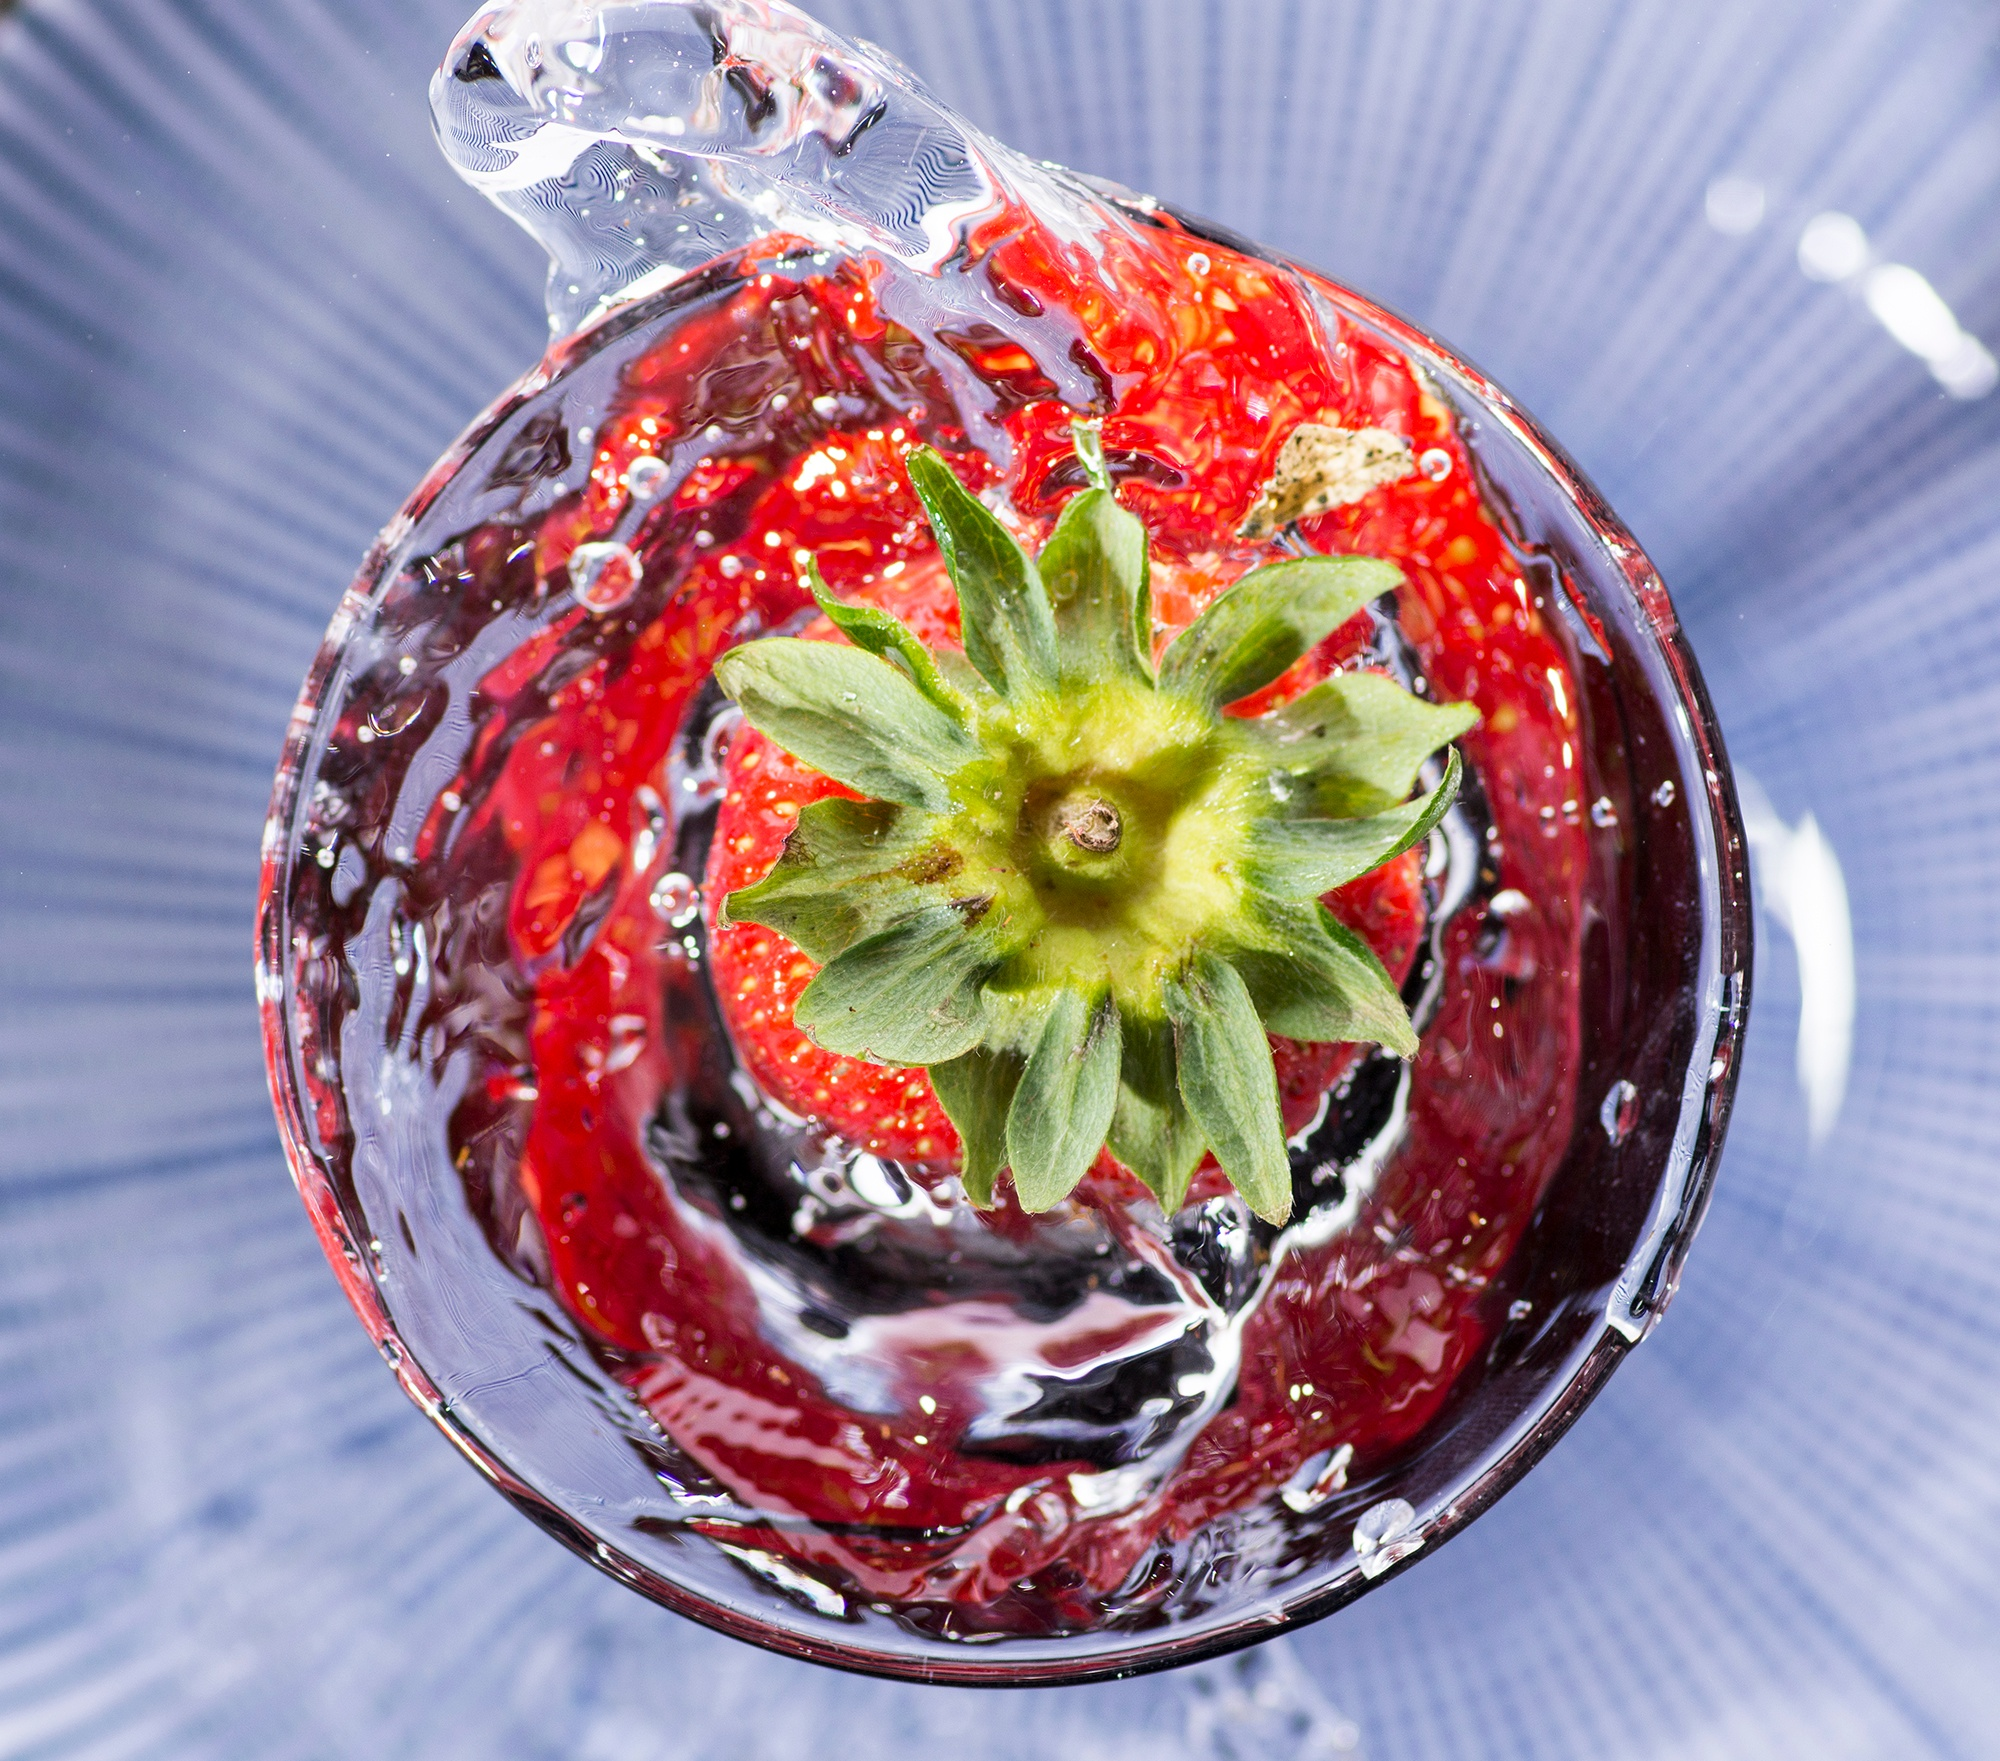 Strawberry Swirl by Ian M